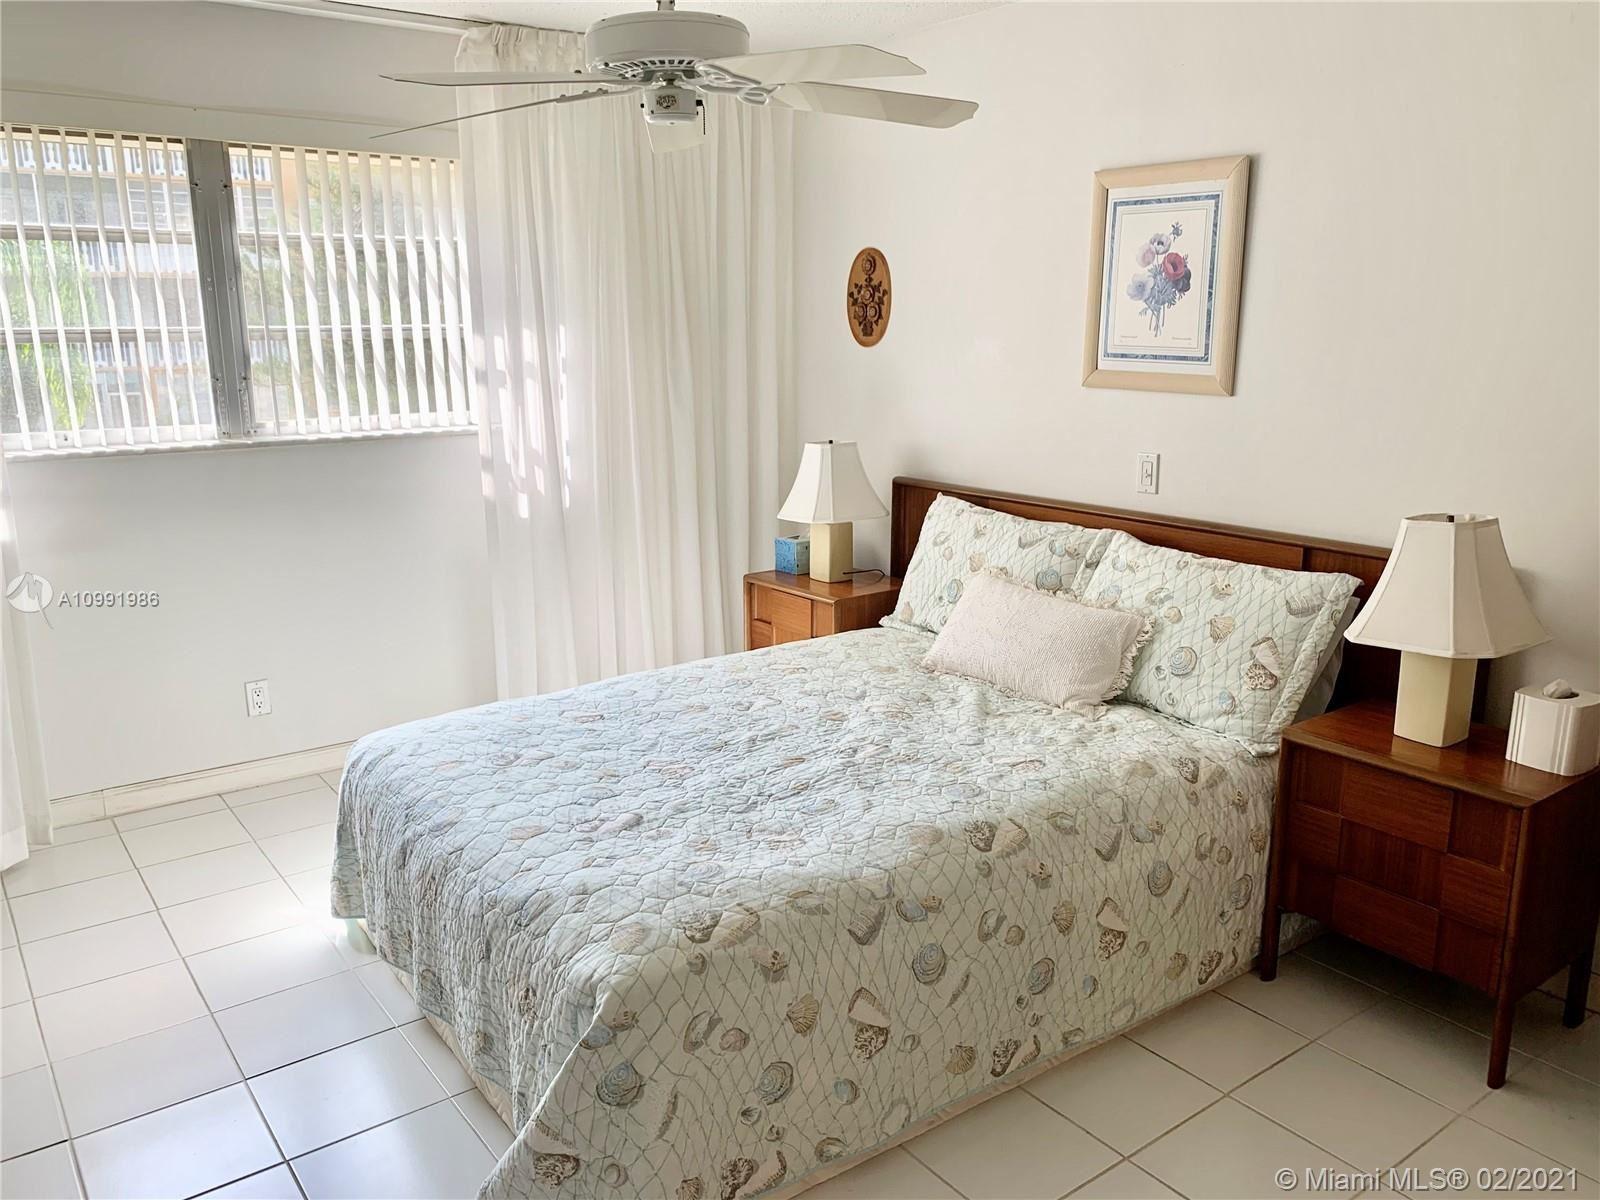 233 NE 14th Ave #205, Hallandale Beach, FL 33009 - #: A10991986